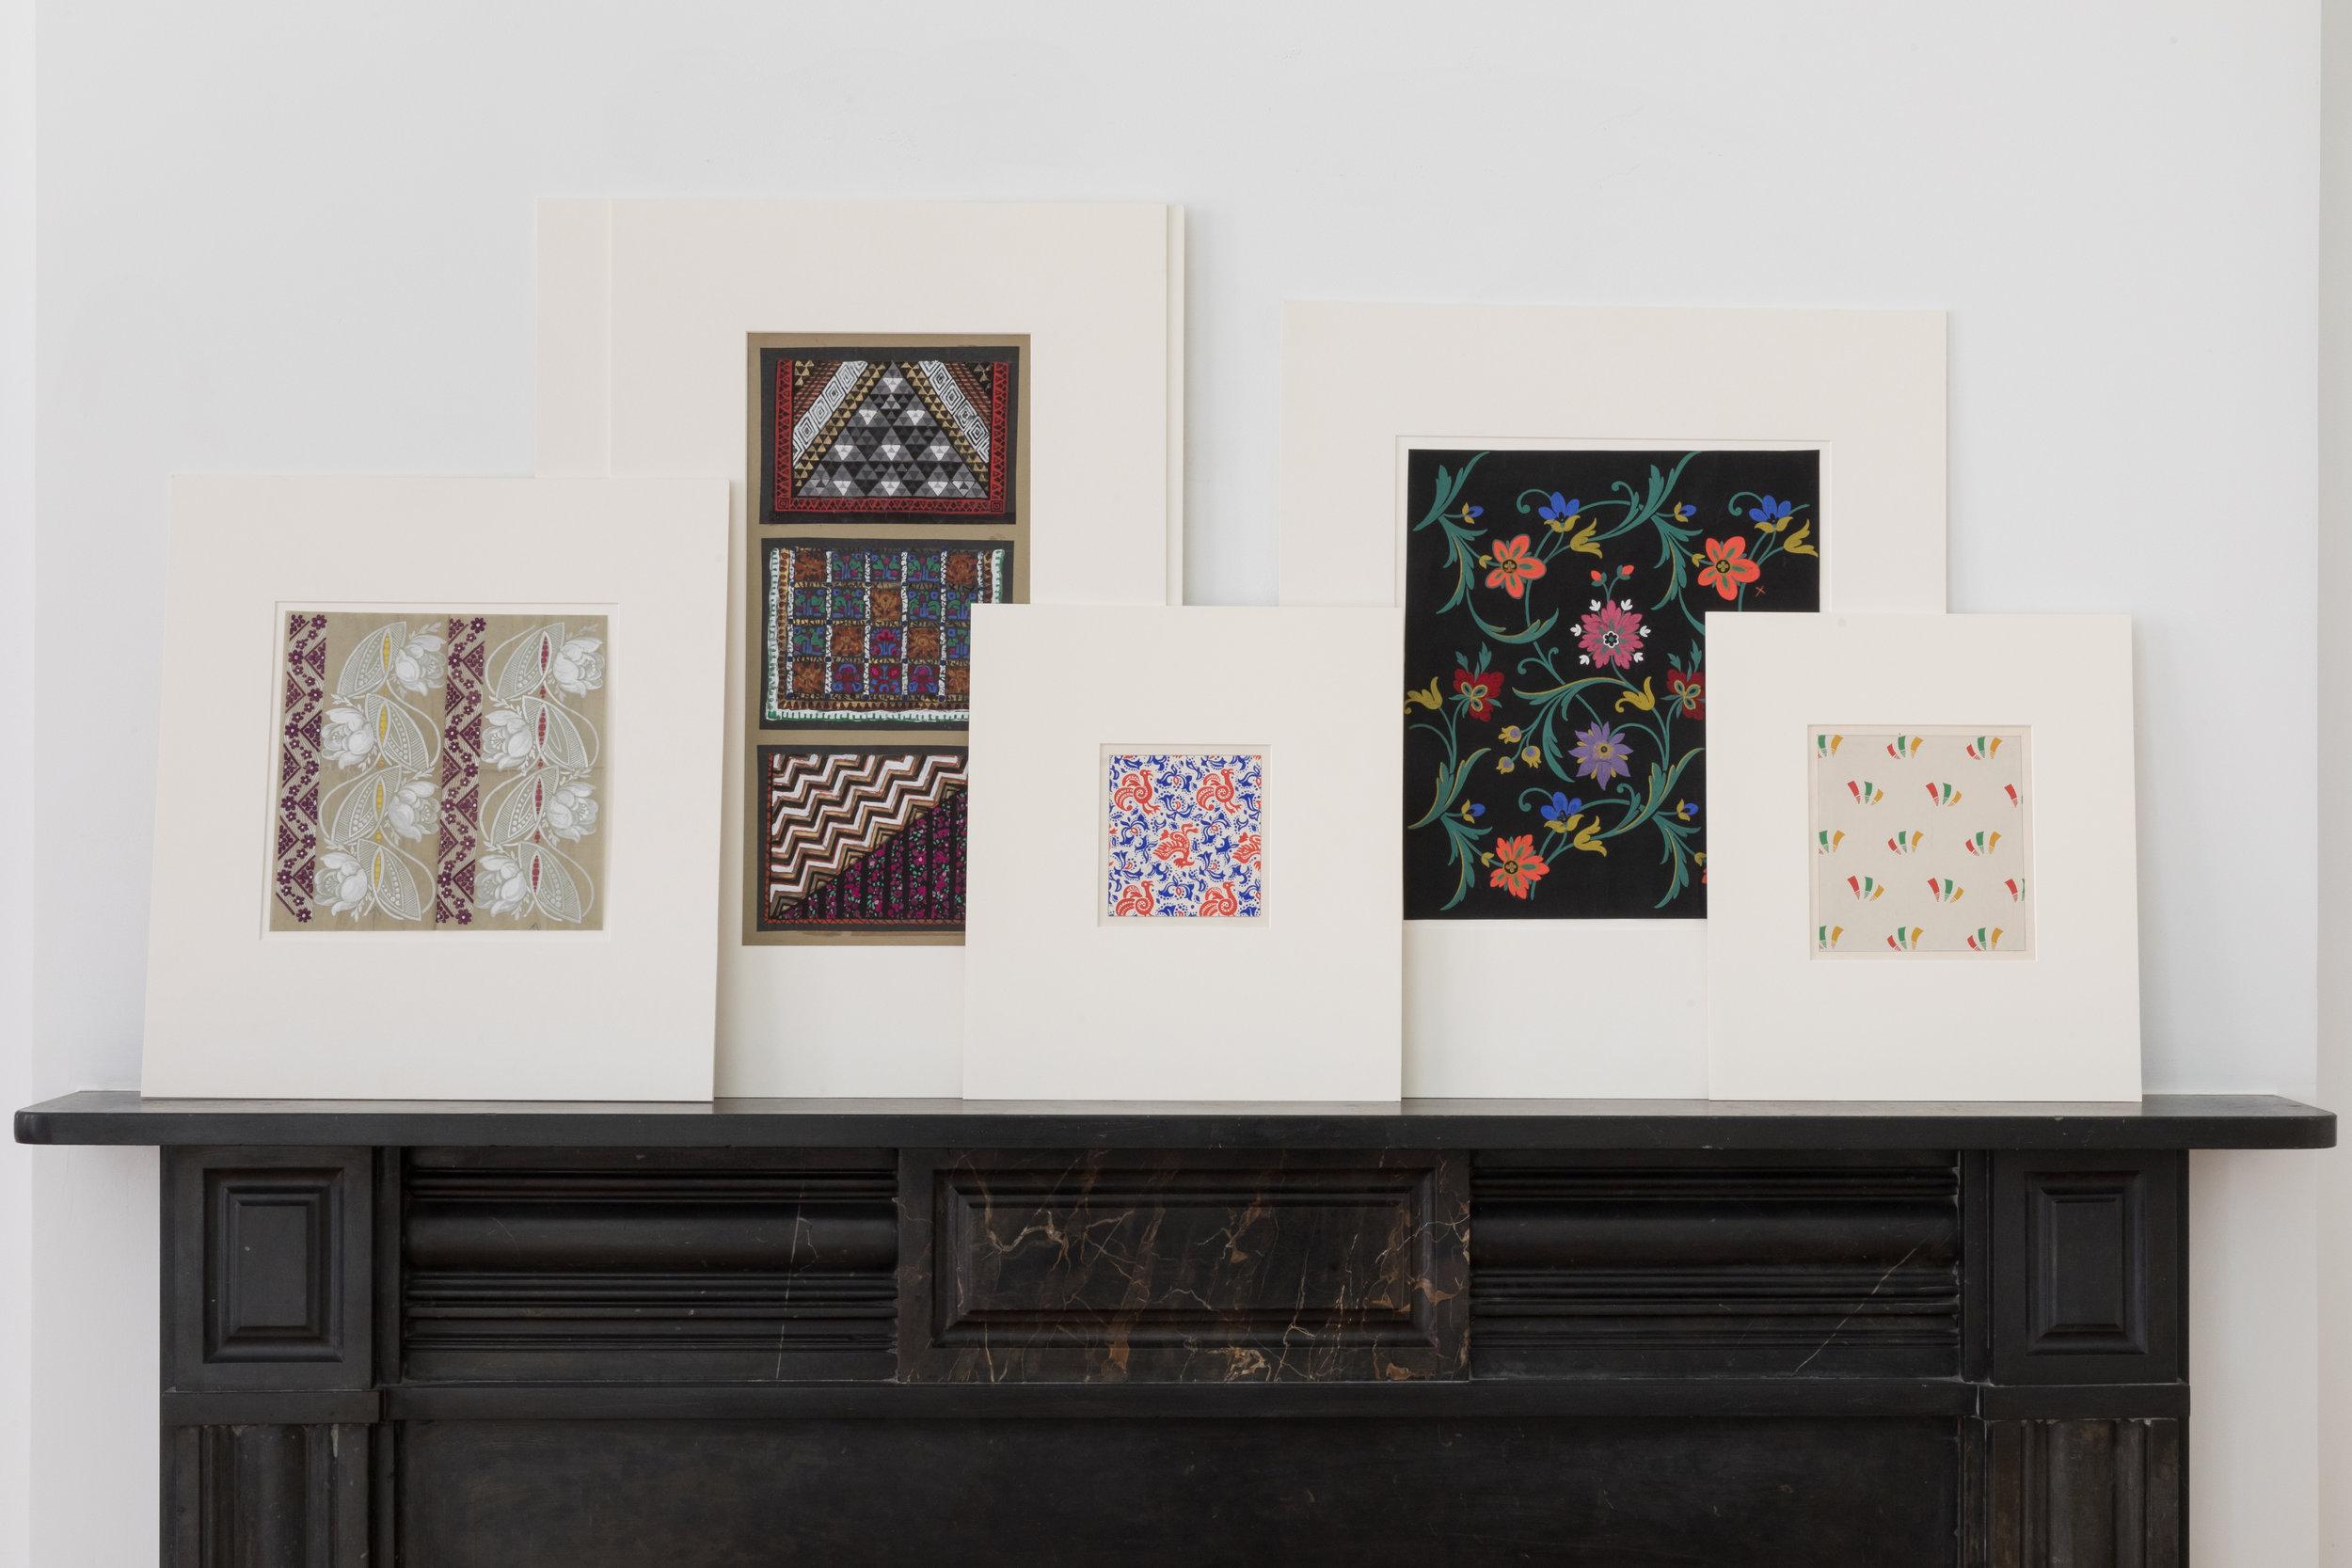 Decorative Arts Designs: Textile Designs